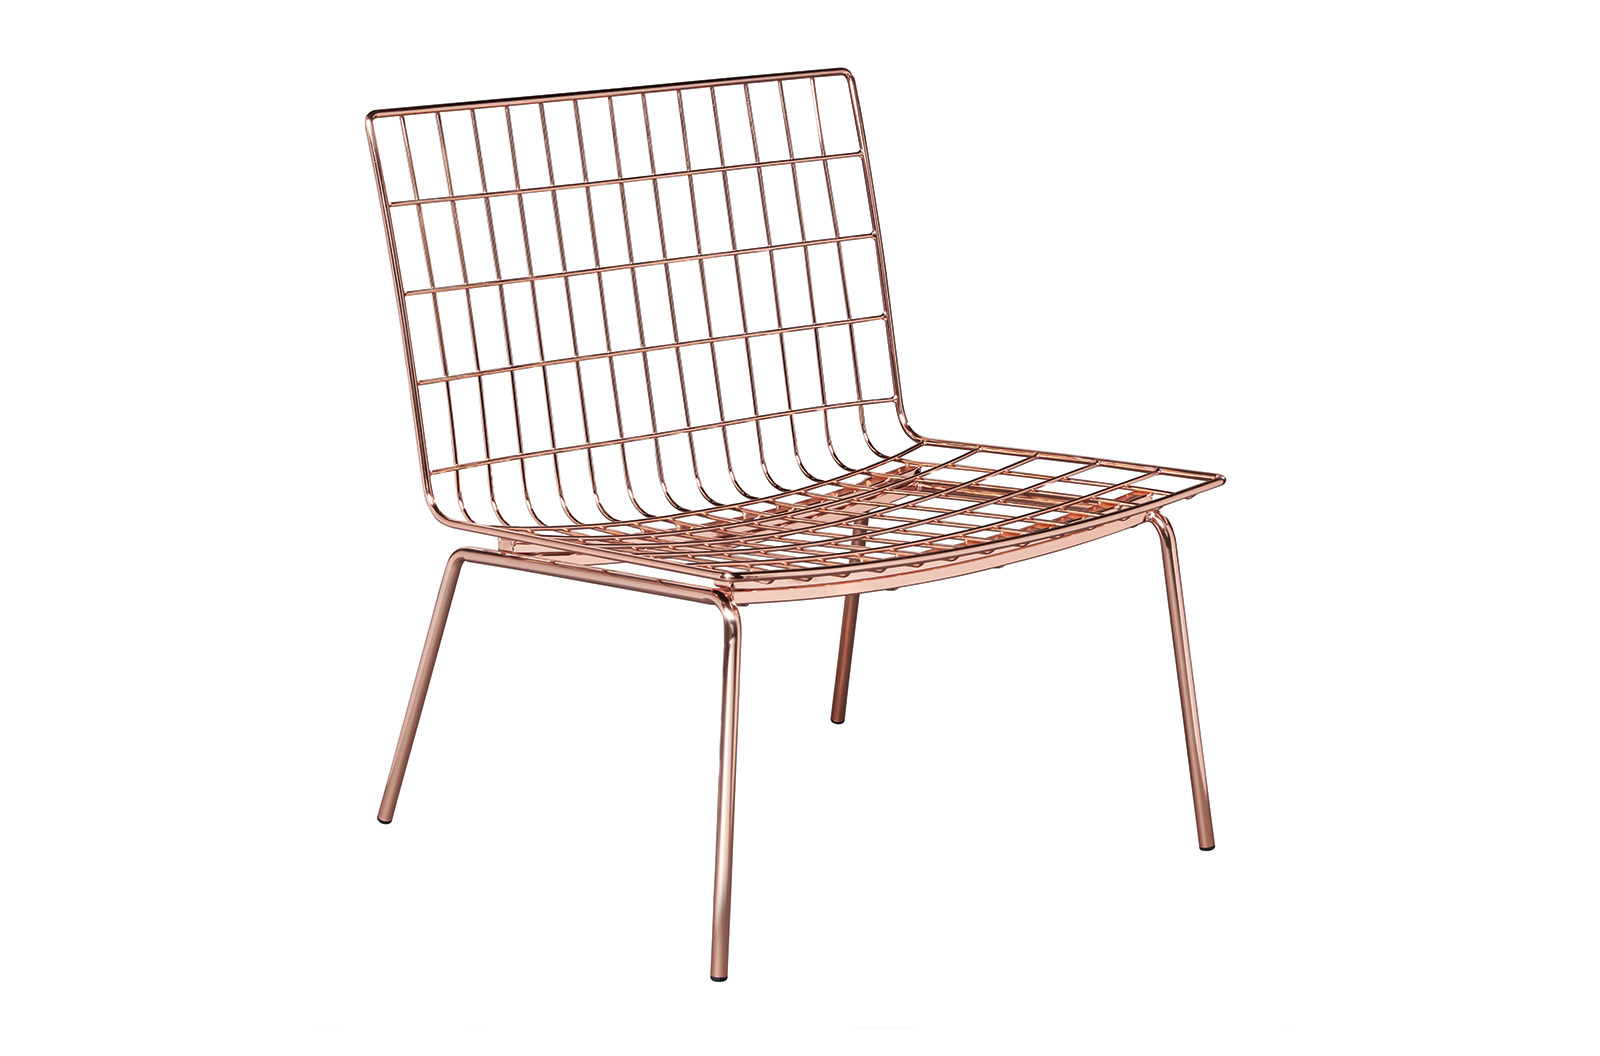 Perpetual Mesh Link Lounge Chair Seasonal Living